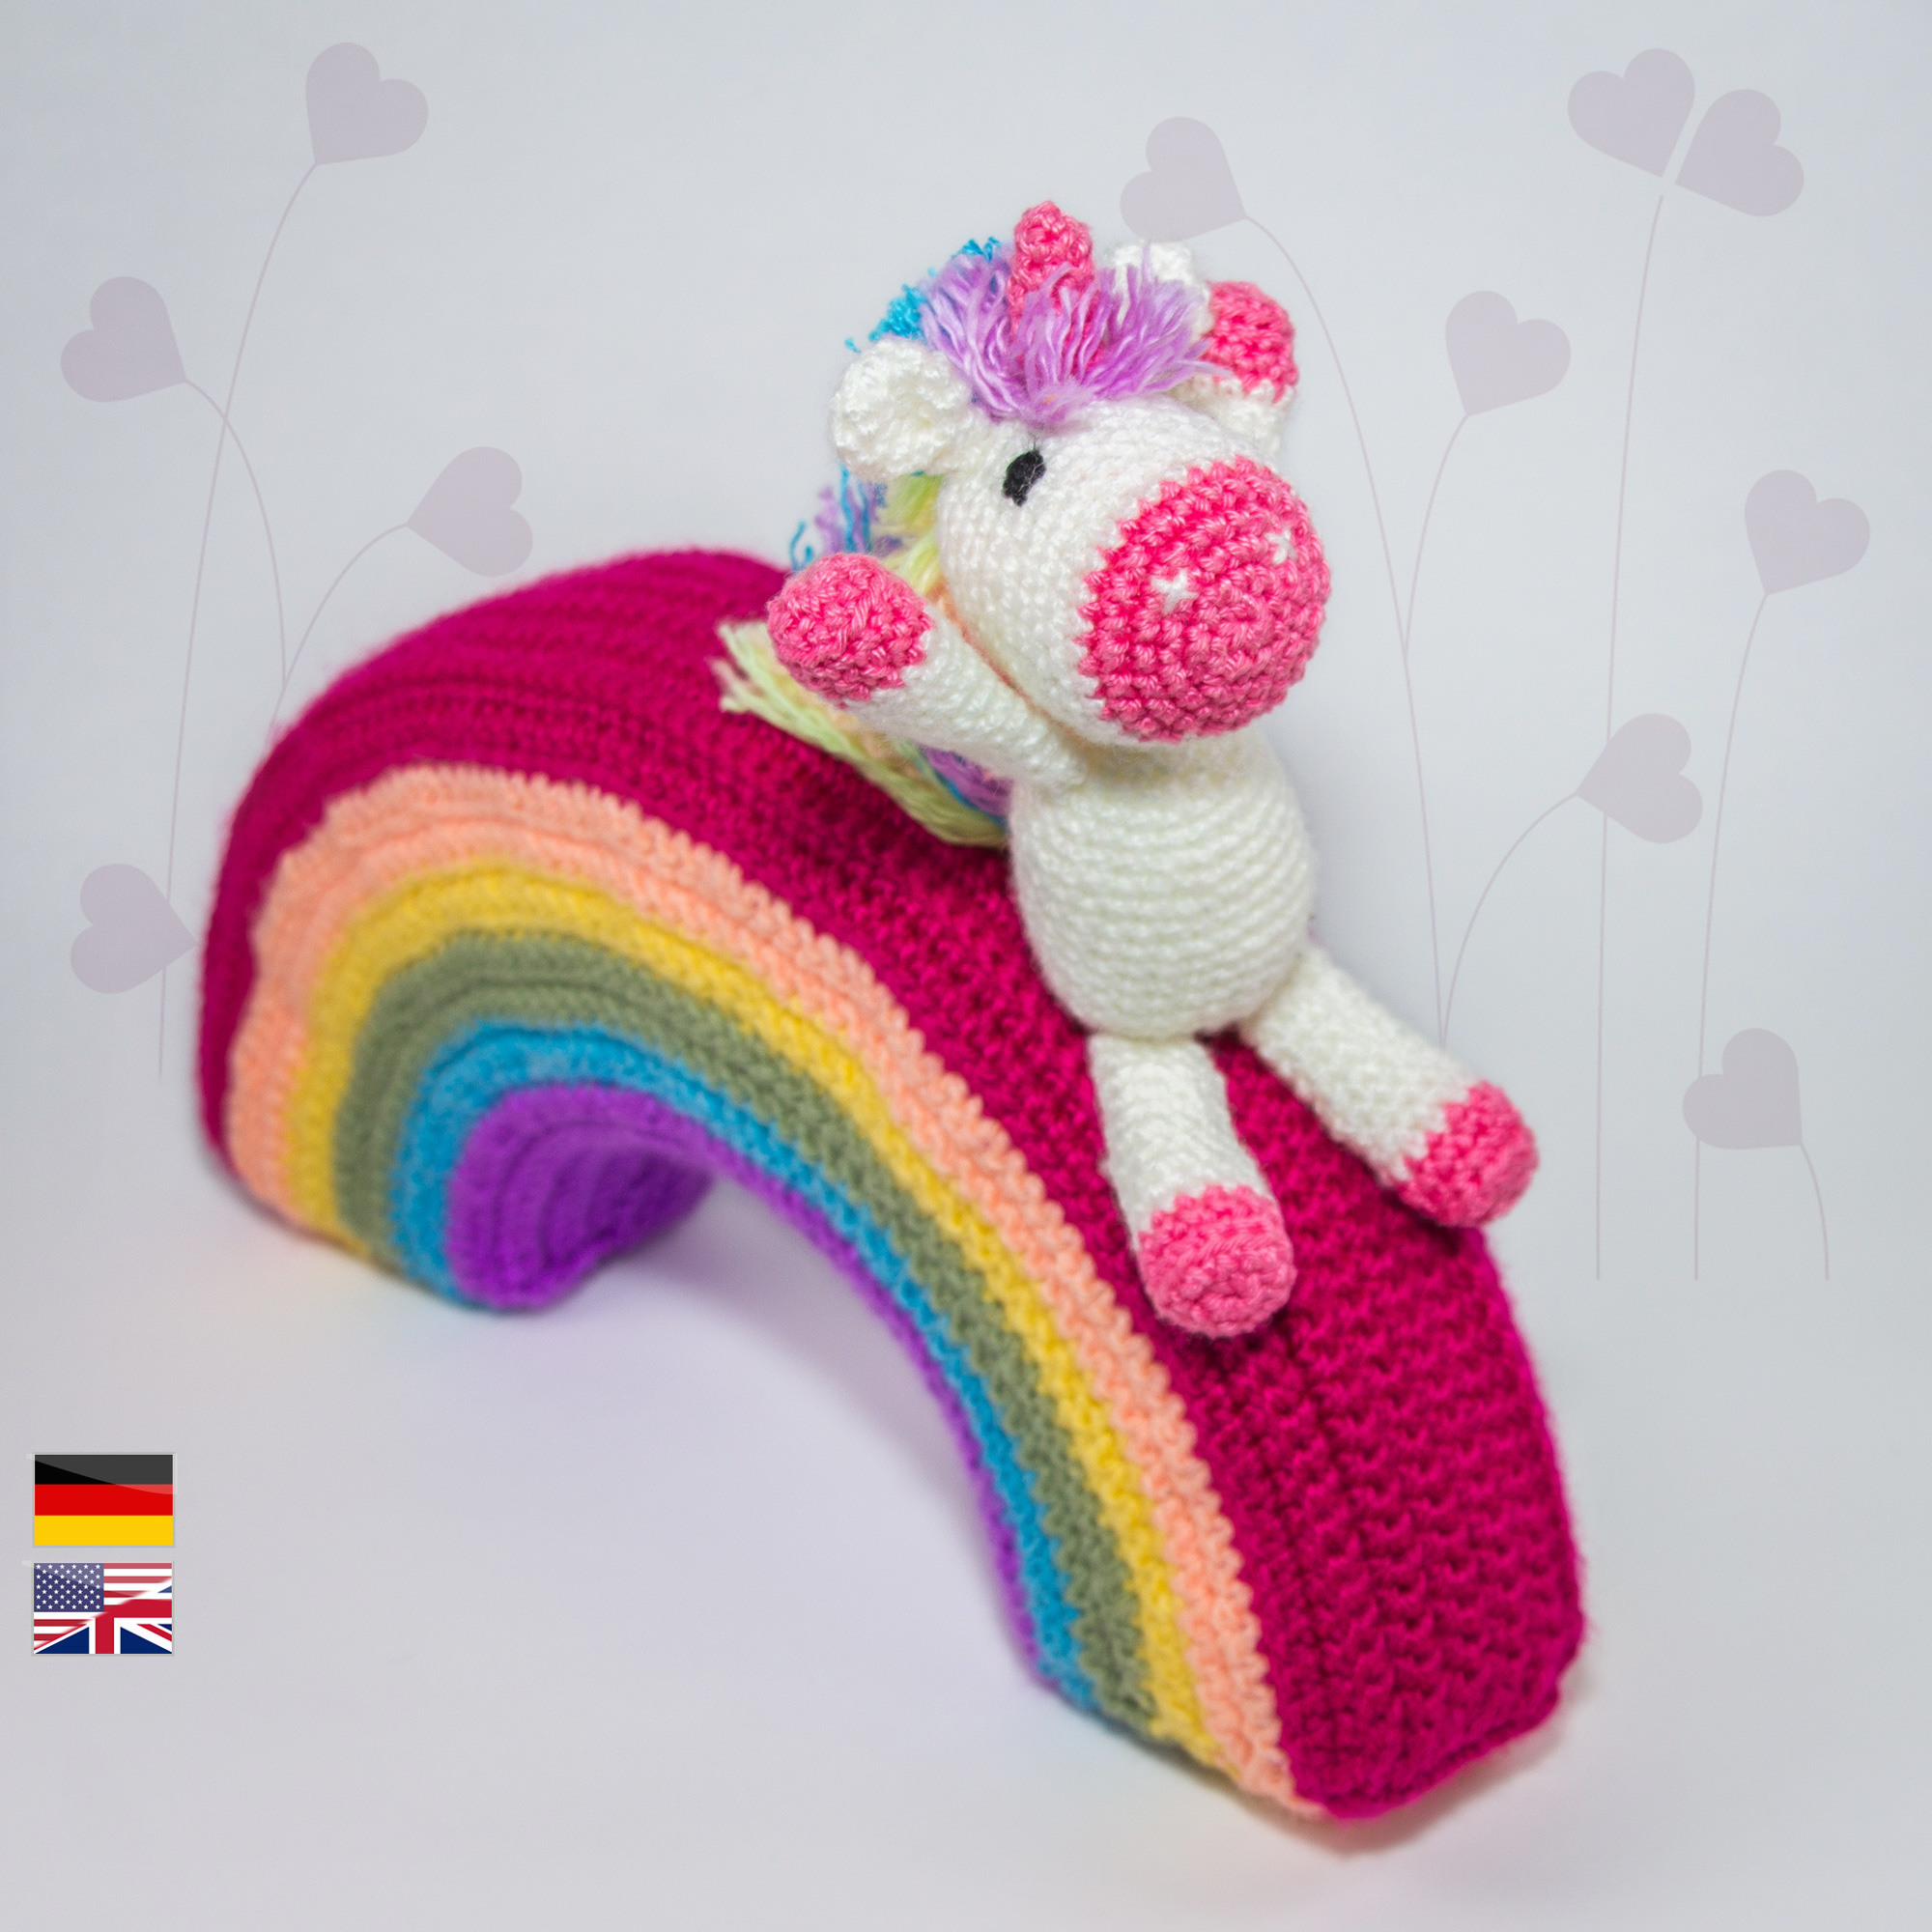 Baby unicorn amigurumi pattern - Amigurumi Today | 2000x2000